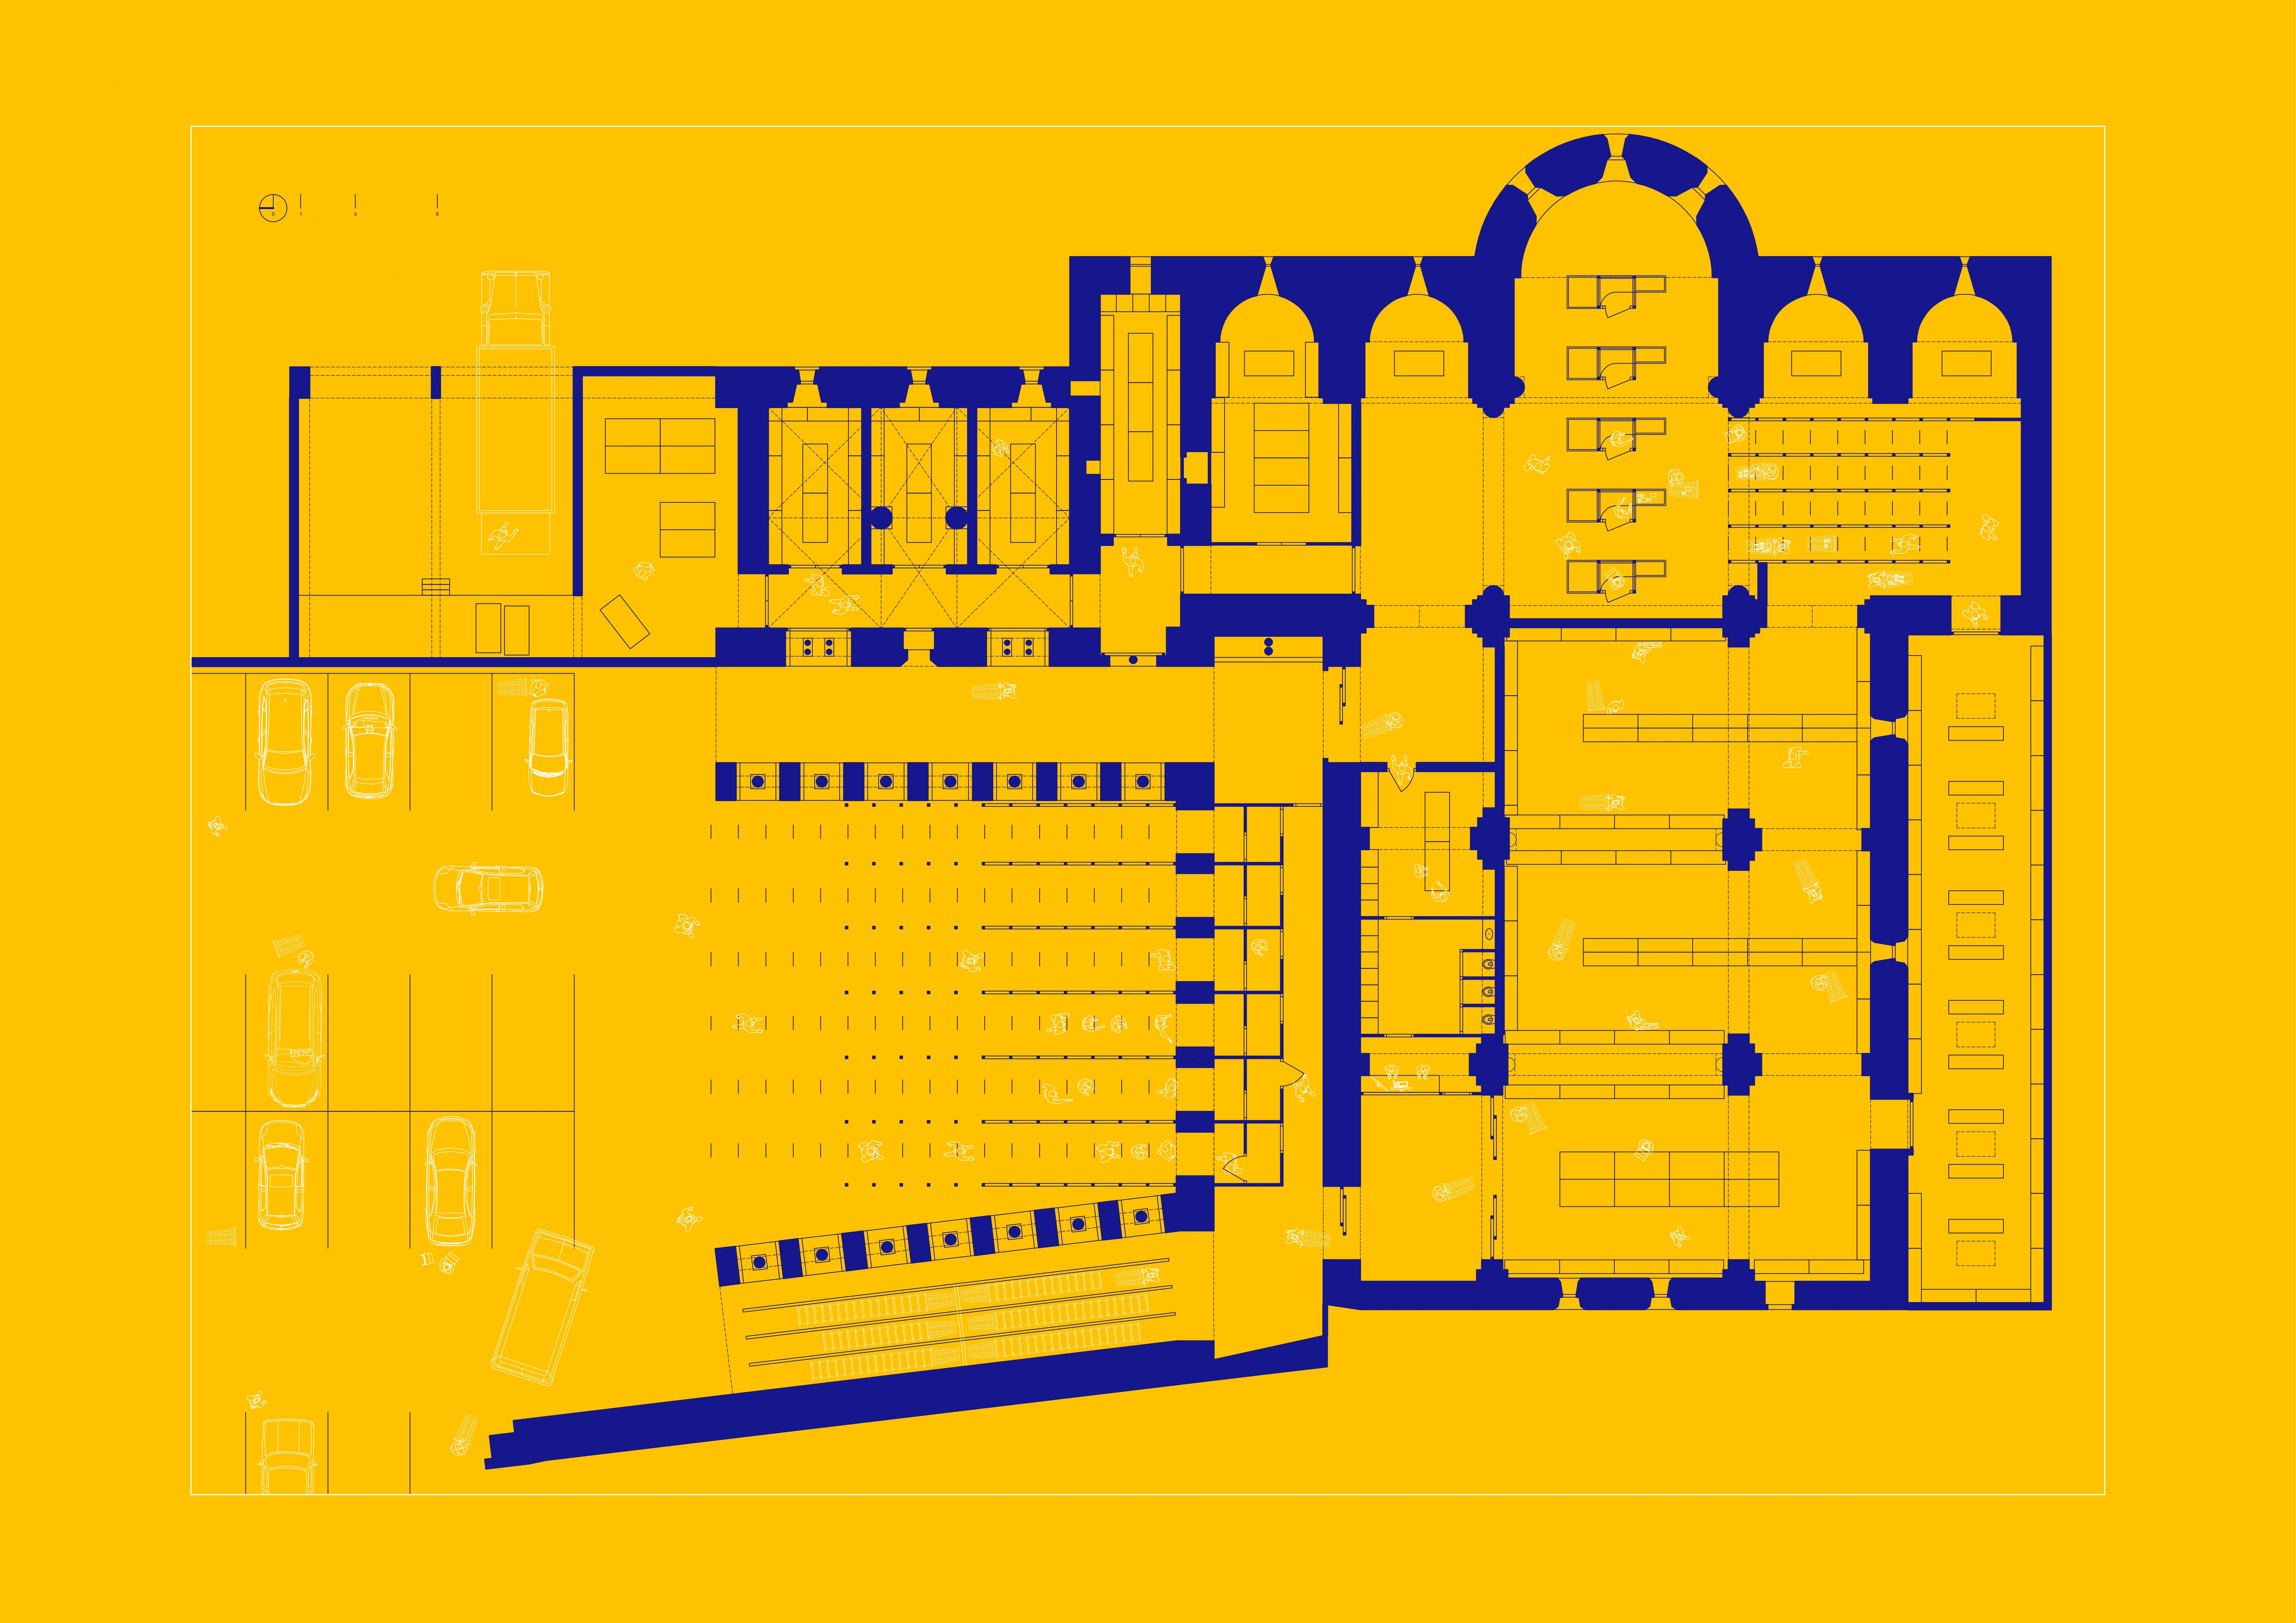 C:UsersDessin2Desktop48h – FLOORPLAN BATTLE48h Floorplan ba